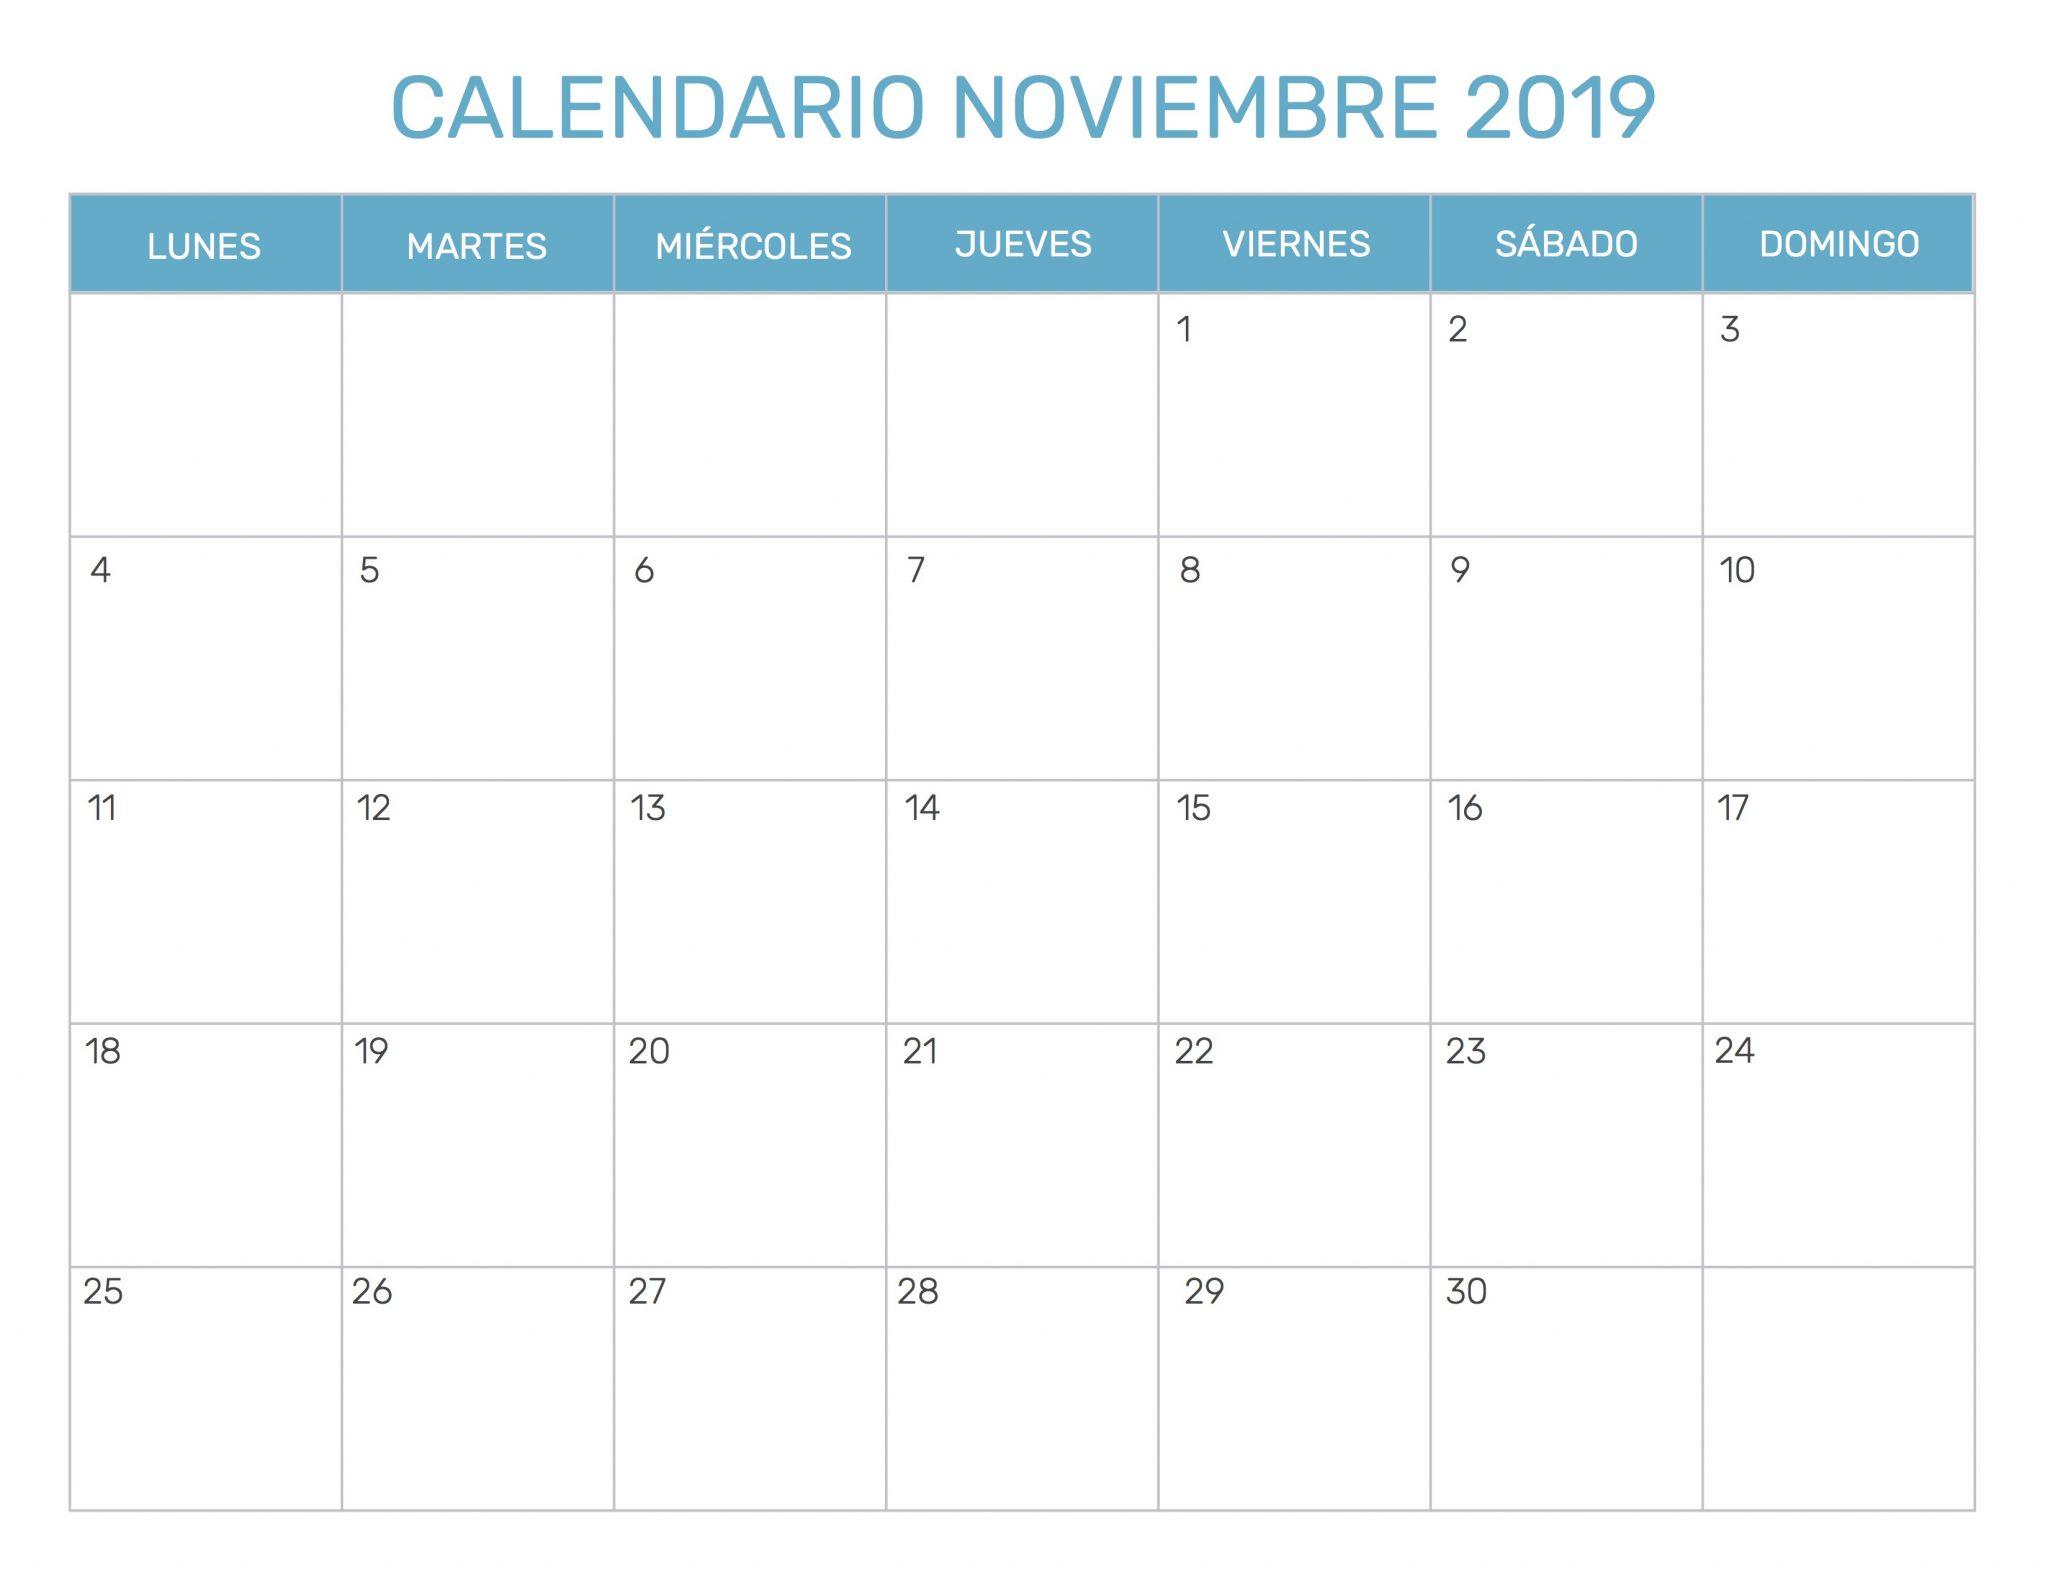 Calendario noviembre 2019 PDF